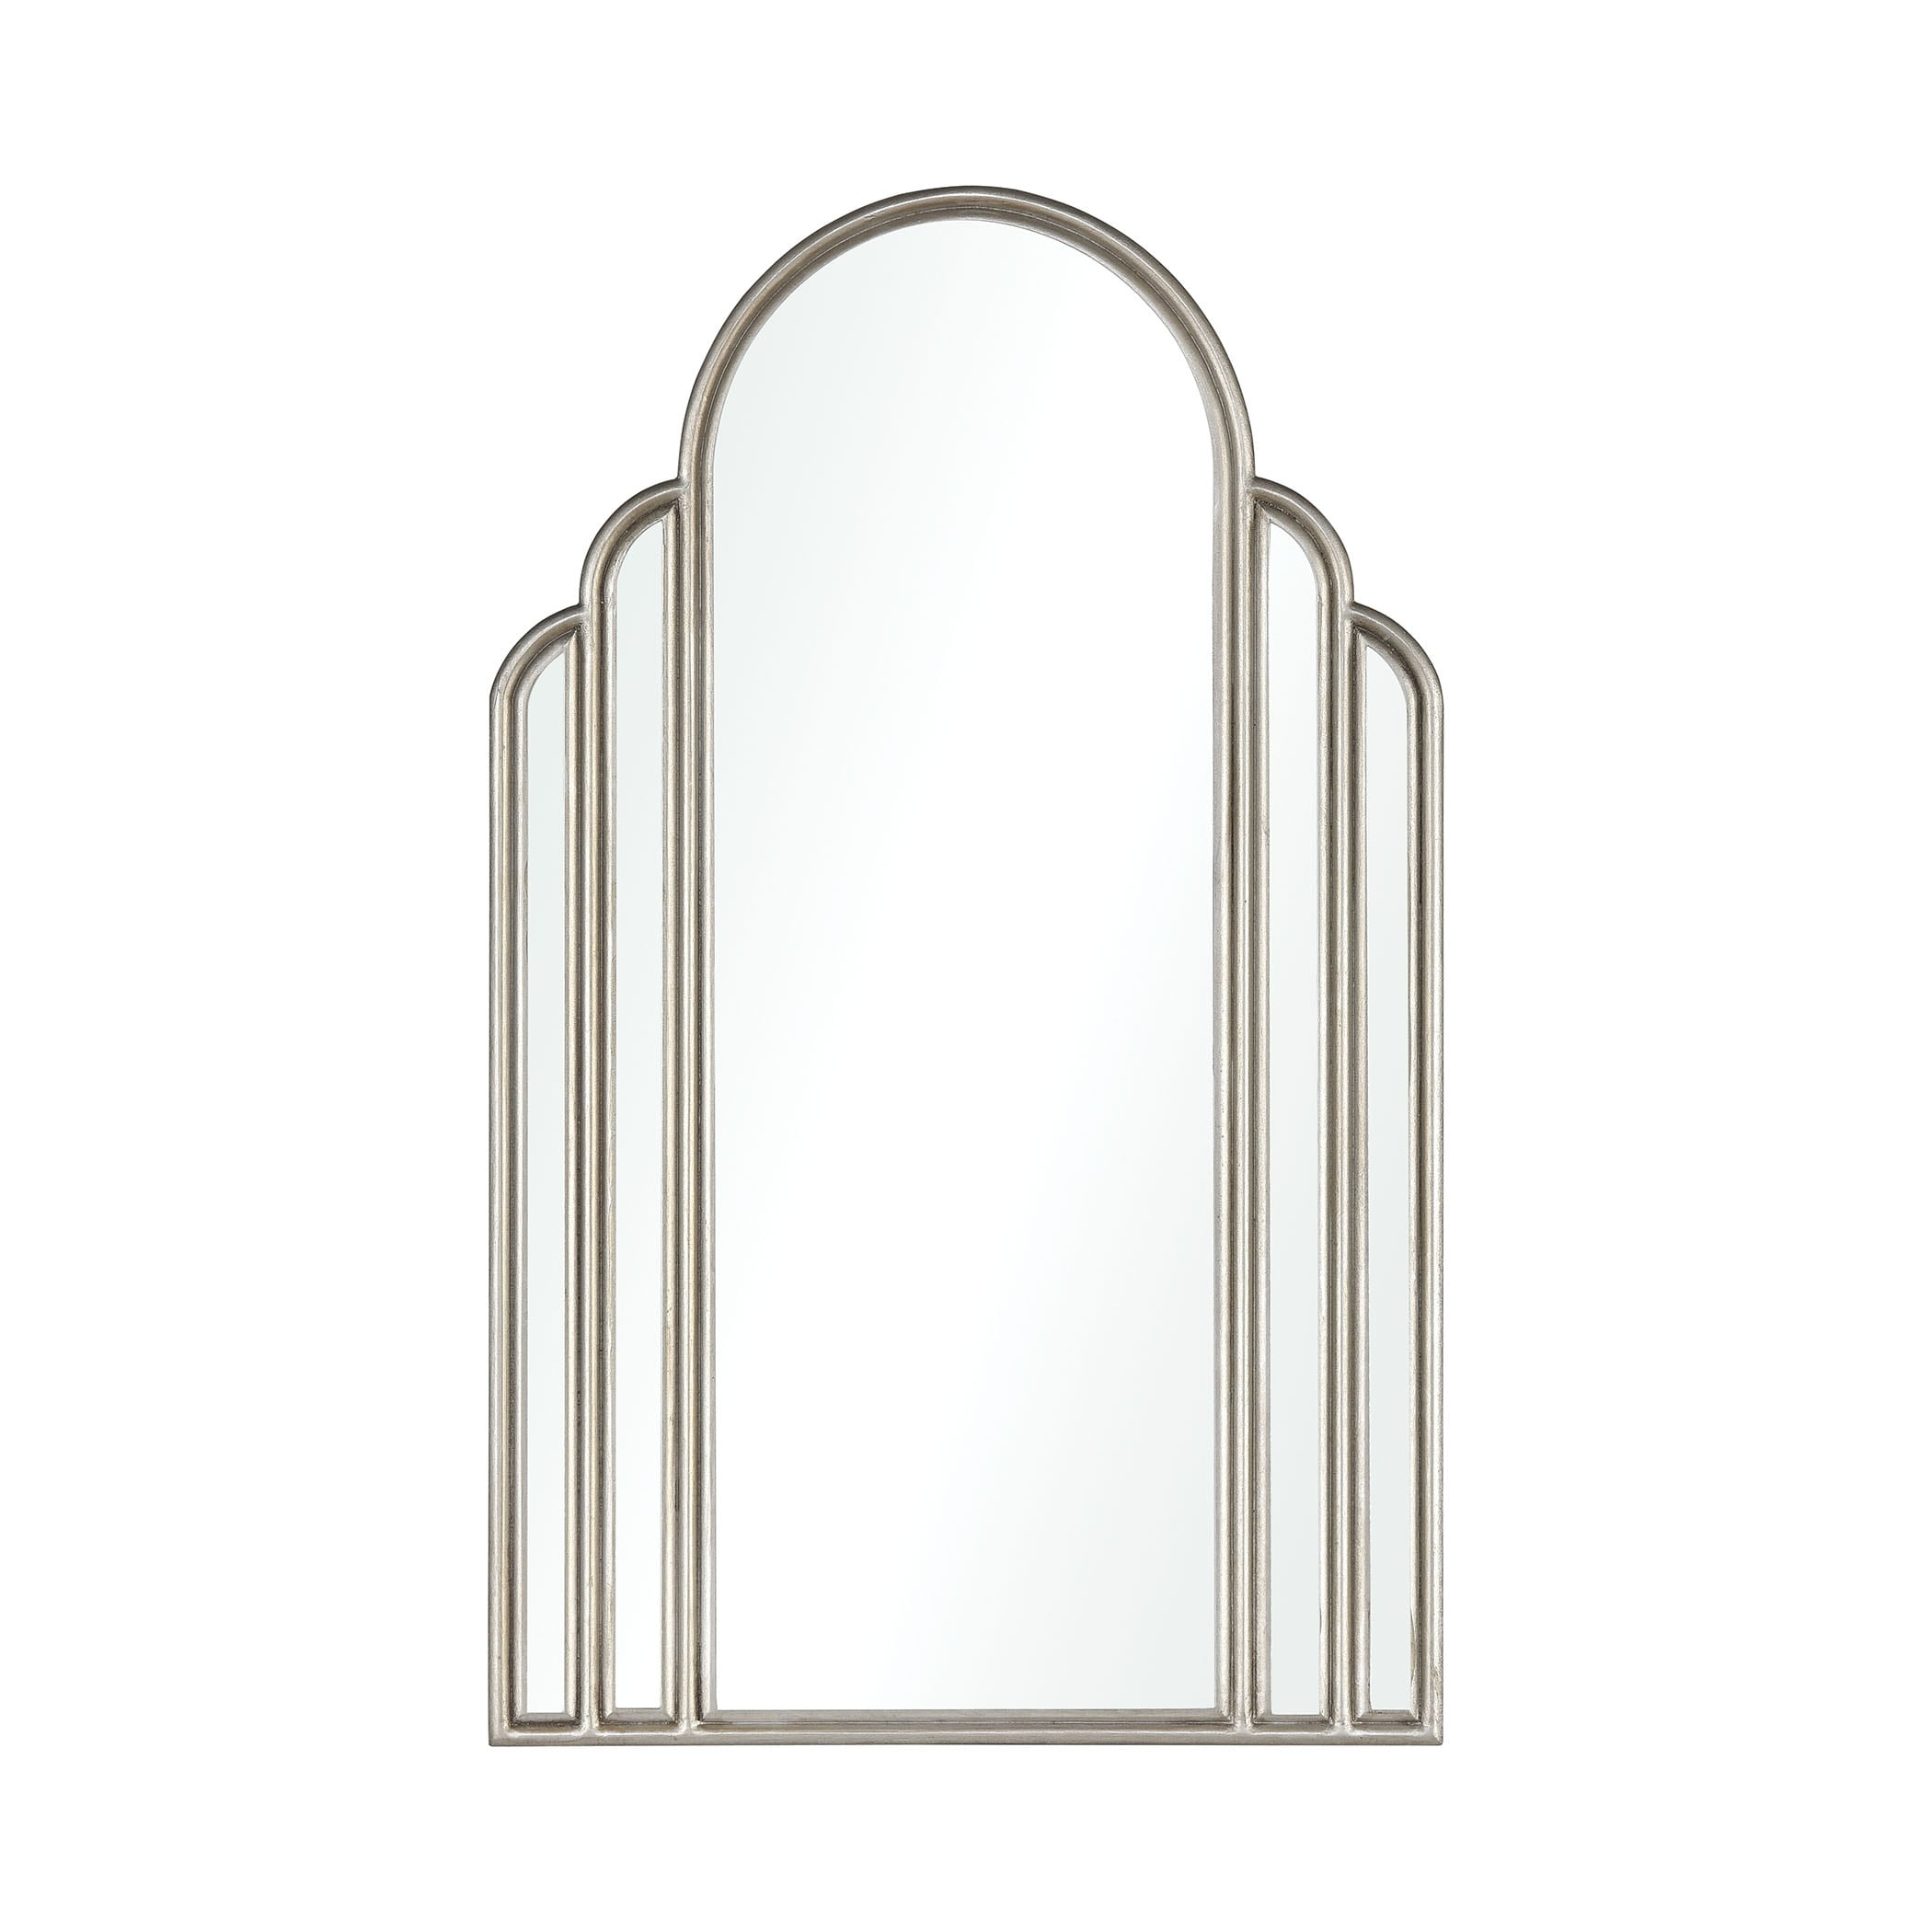 Silver Arch Shaped Wall Mirror Art Deco